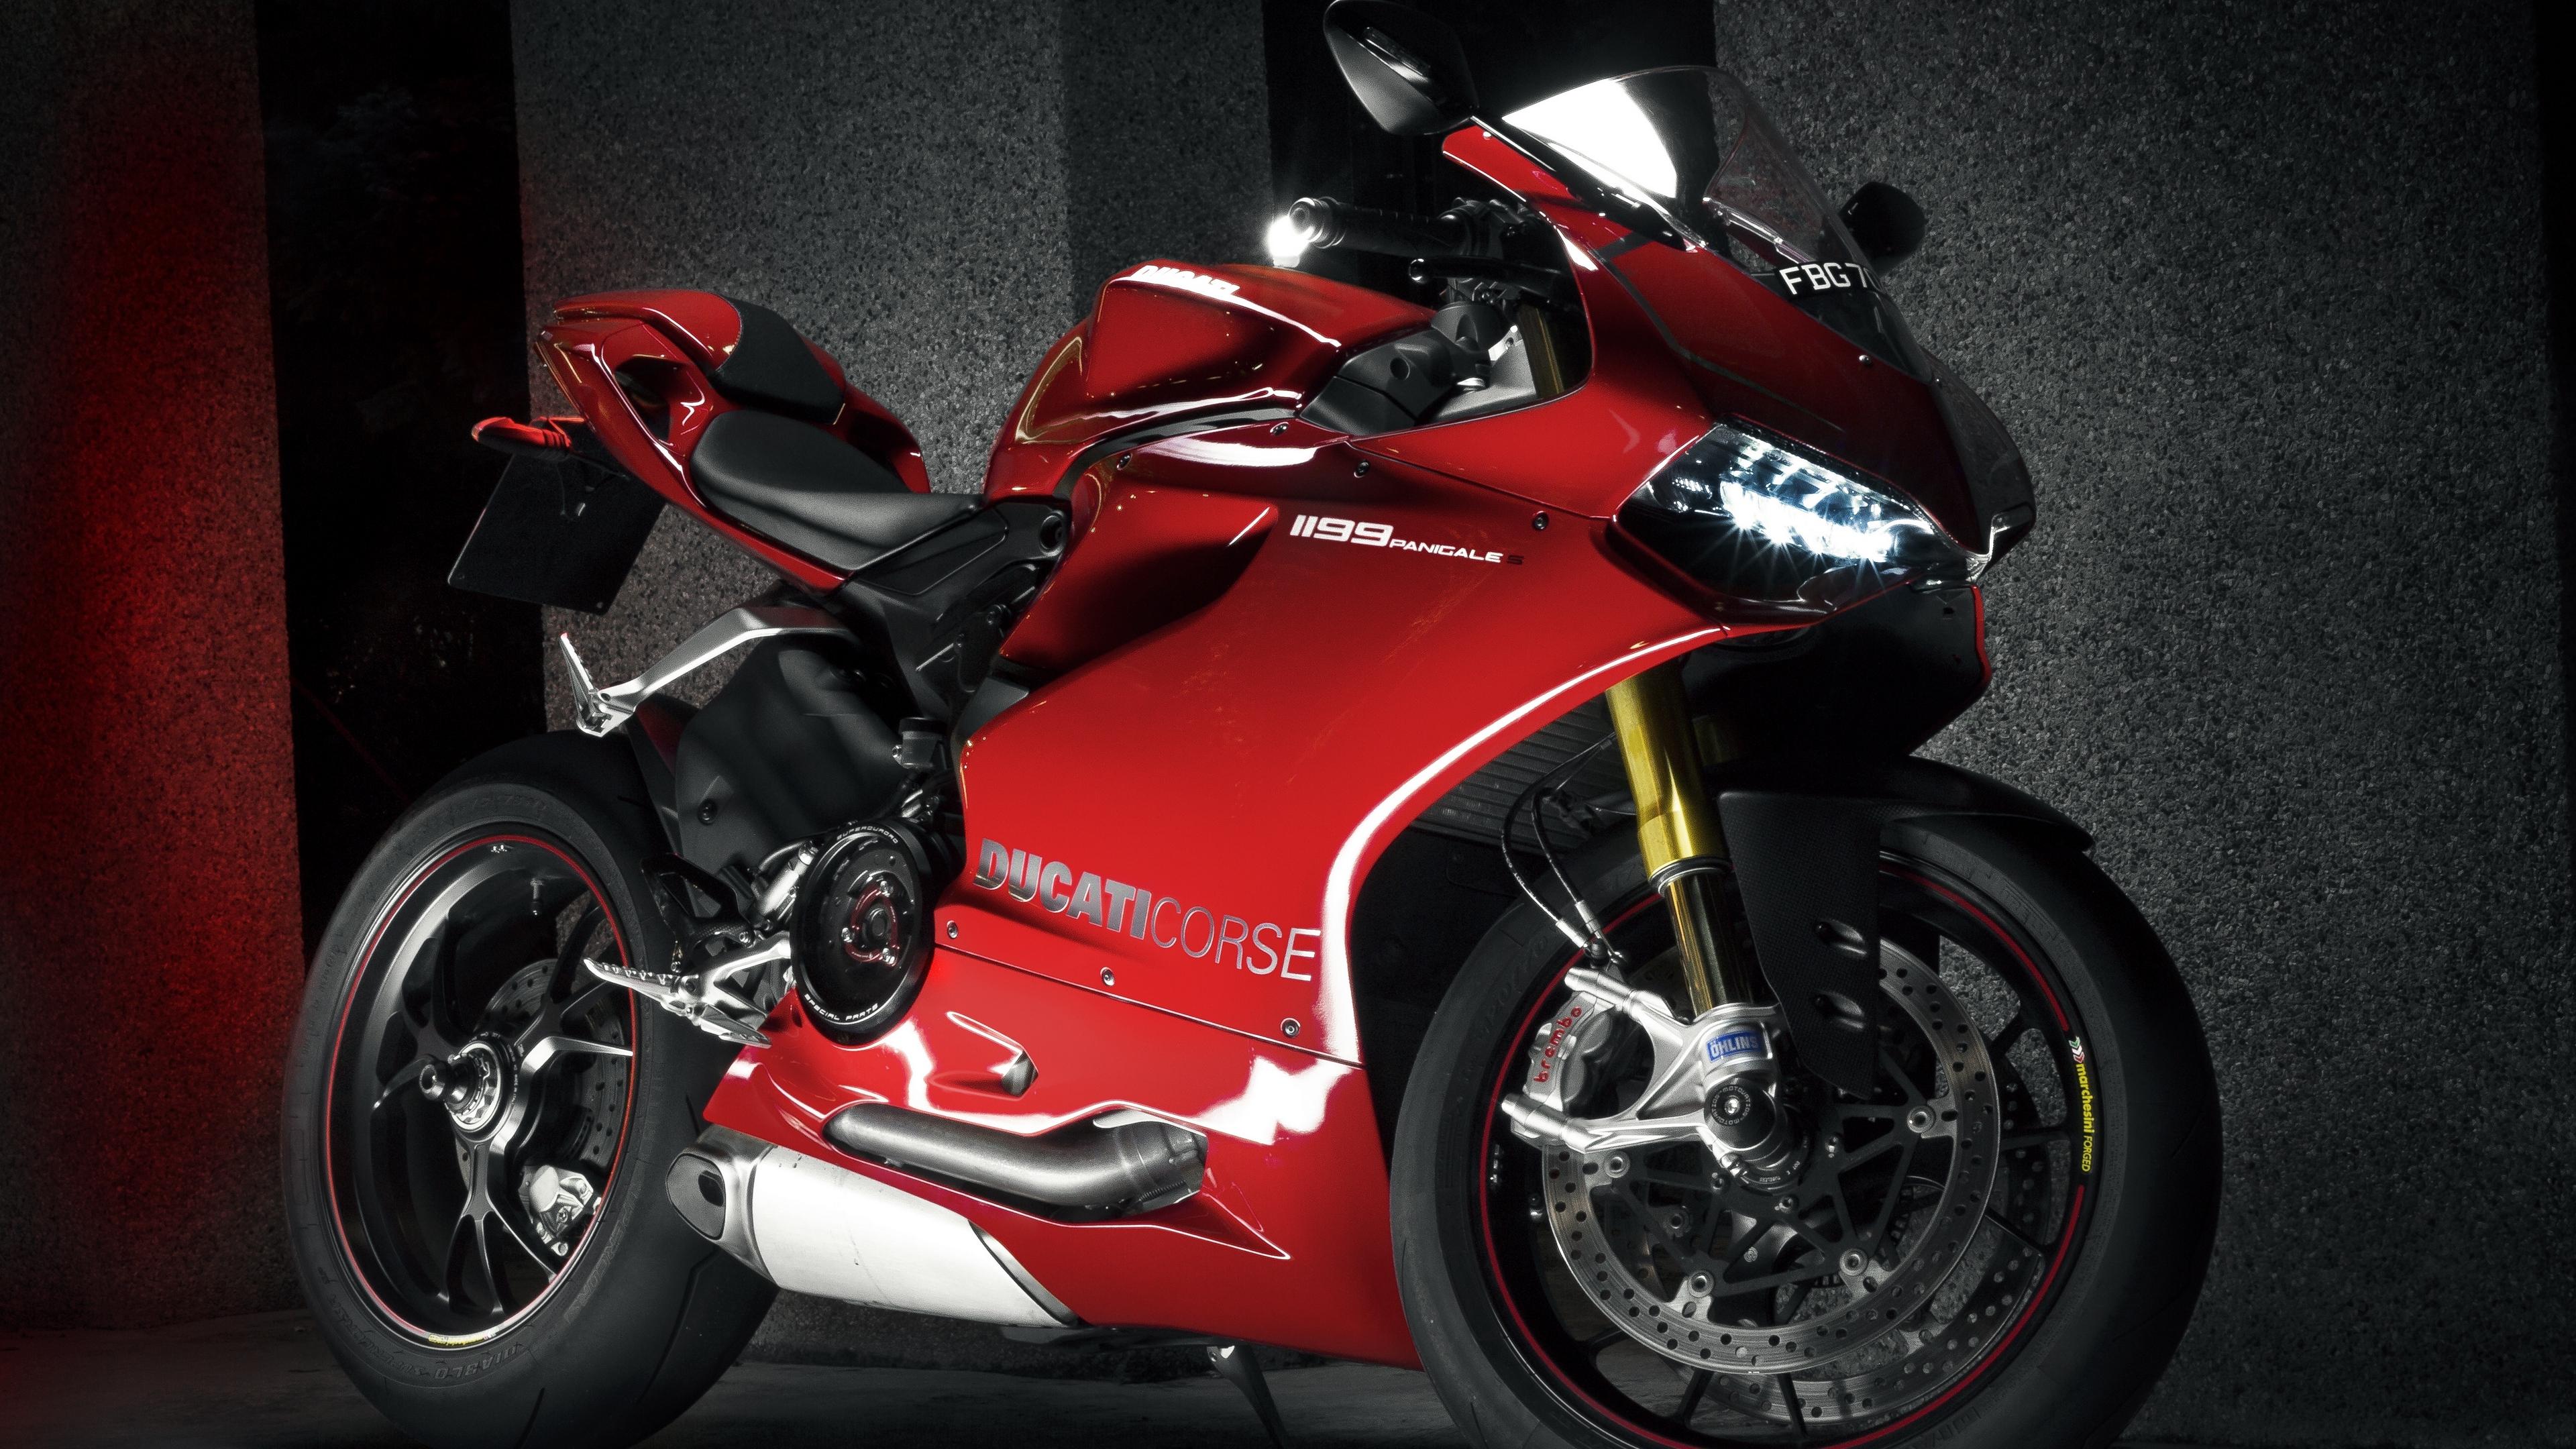 ducati 1199 ducati 1199 panigale motorcycle red 4k 1536018931 - ducati, 1199, ducati 1199 panigale, motorcycle, red 4k - ducati 1199 panigale, Ducati, 1199